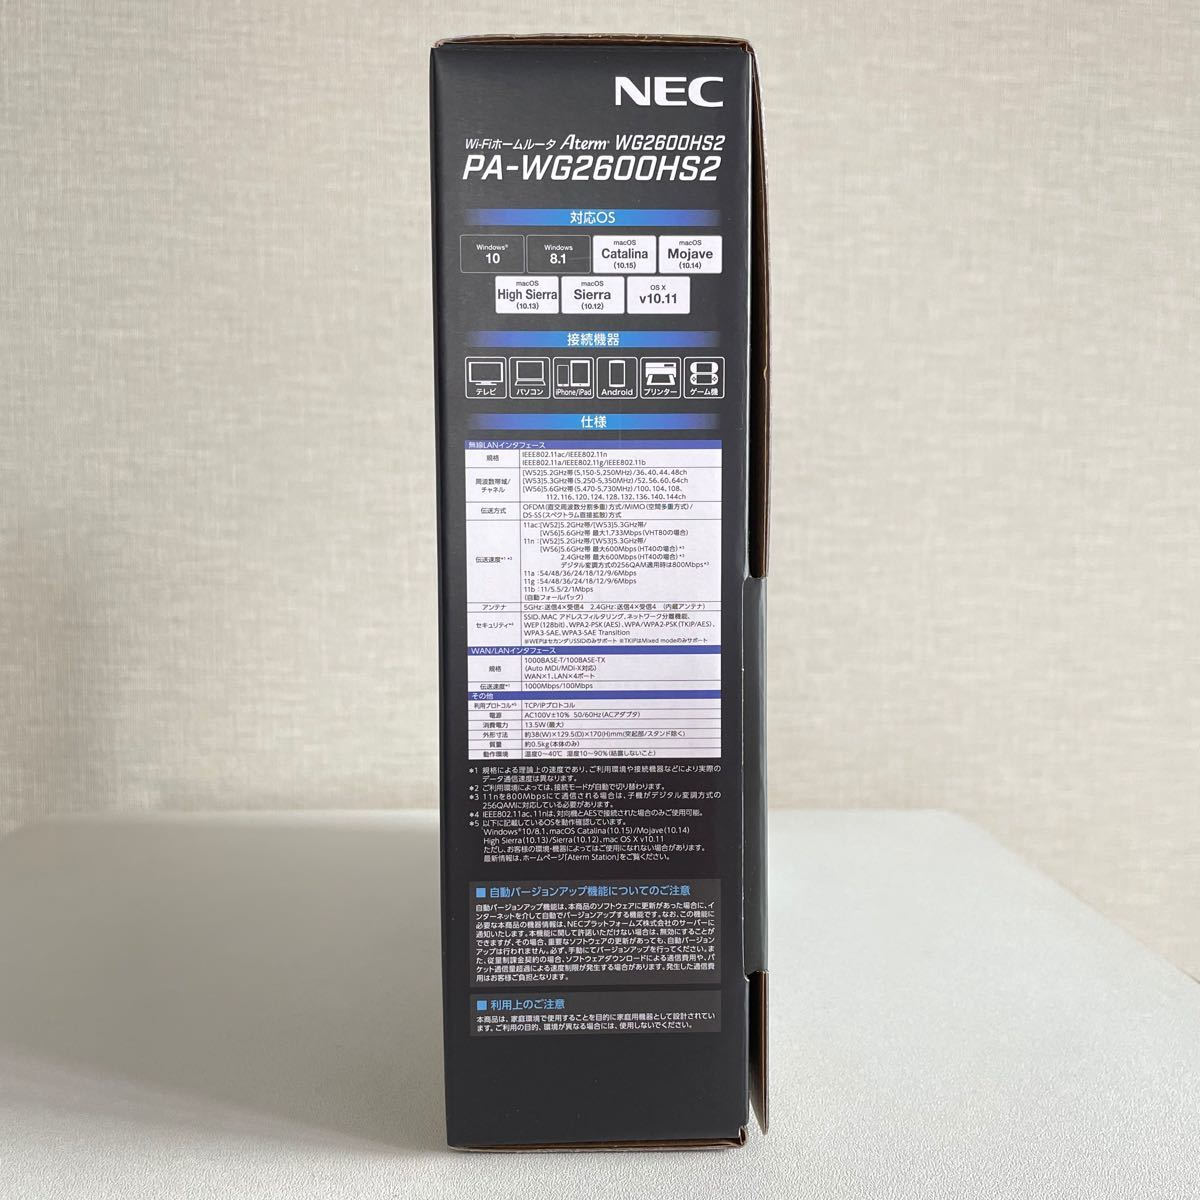 NEC Aterm WG2600HS2 PA-WG2600HS2 ルーター 無線LANルーター Wi-Fiルーター